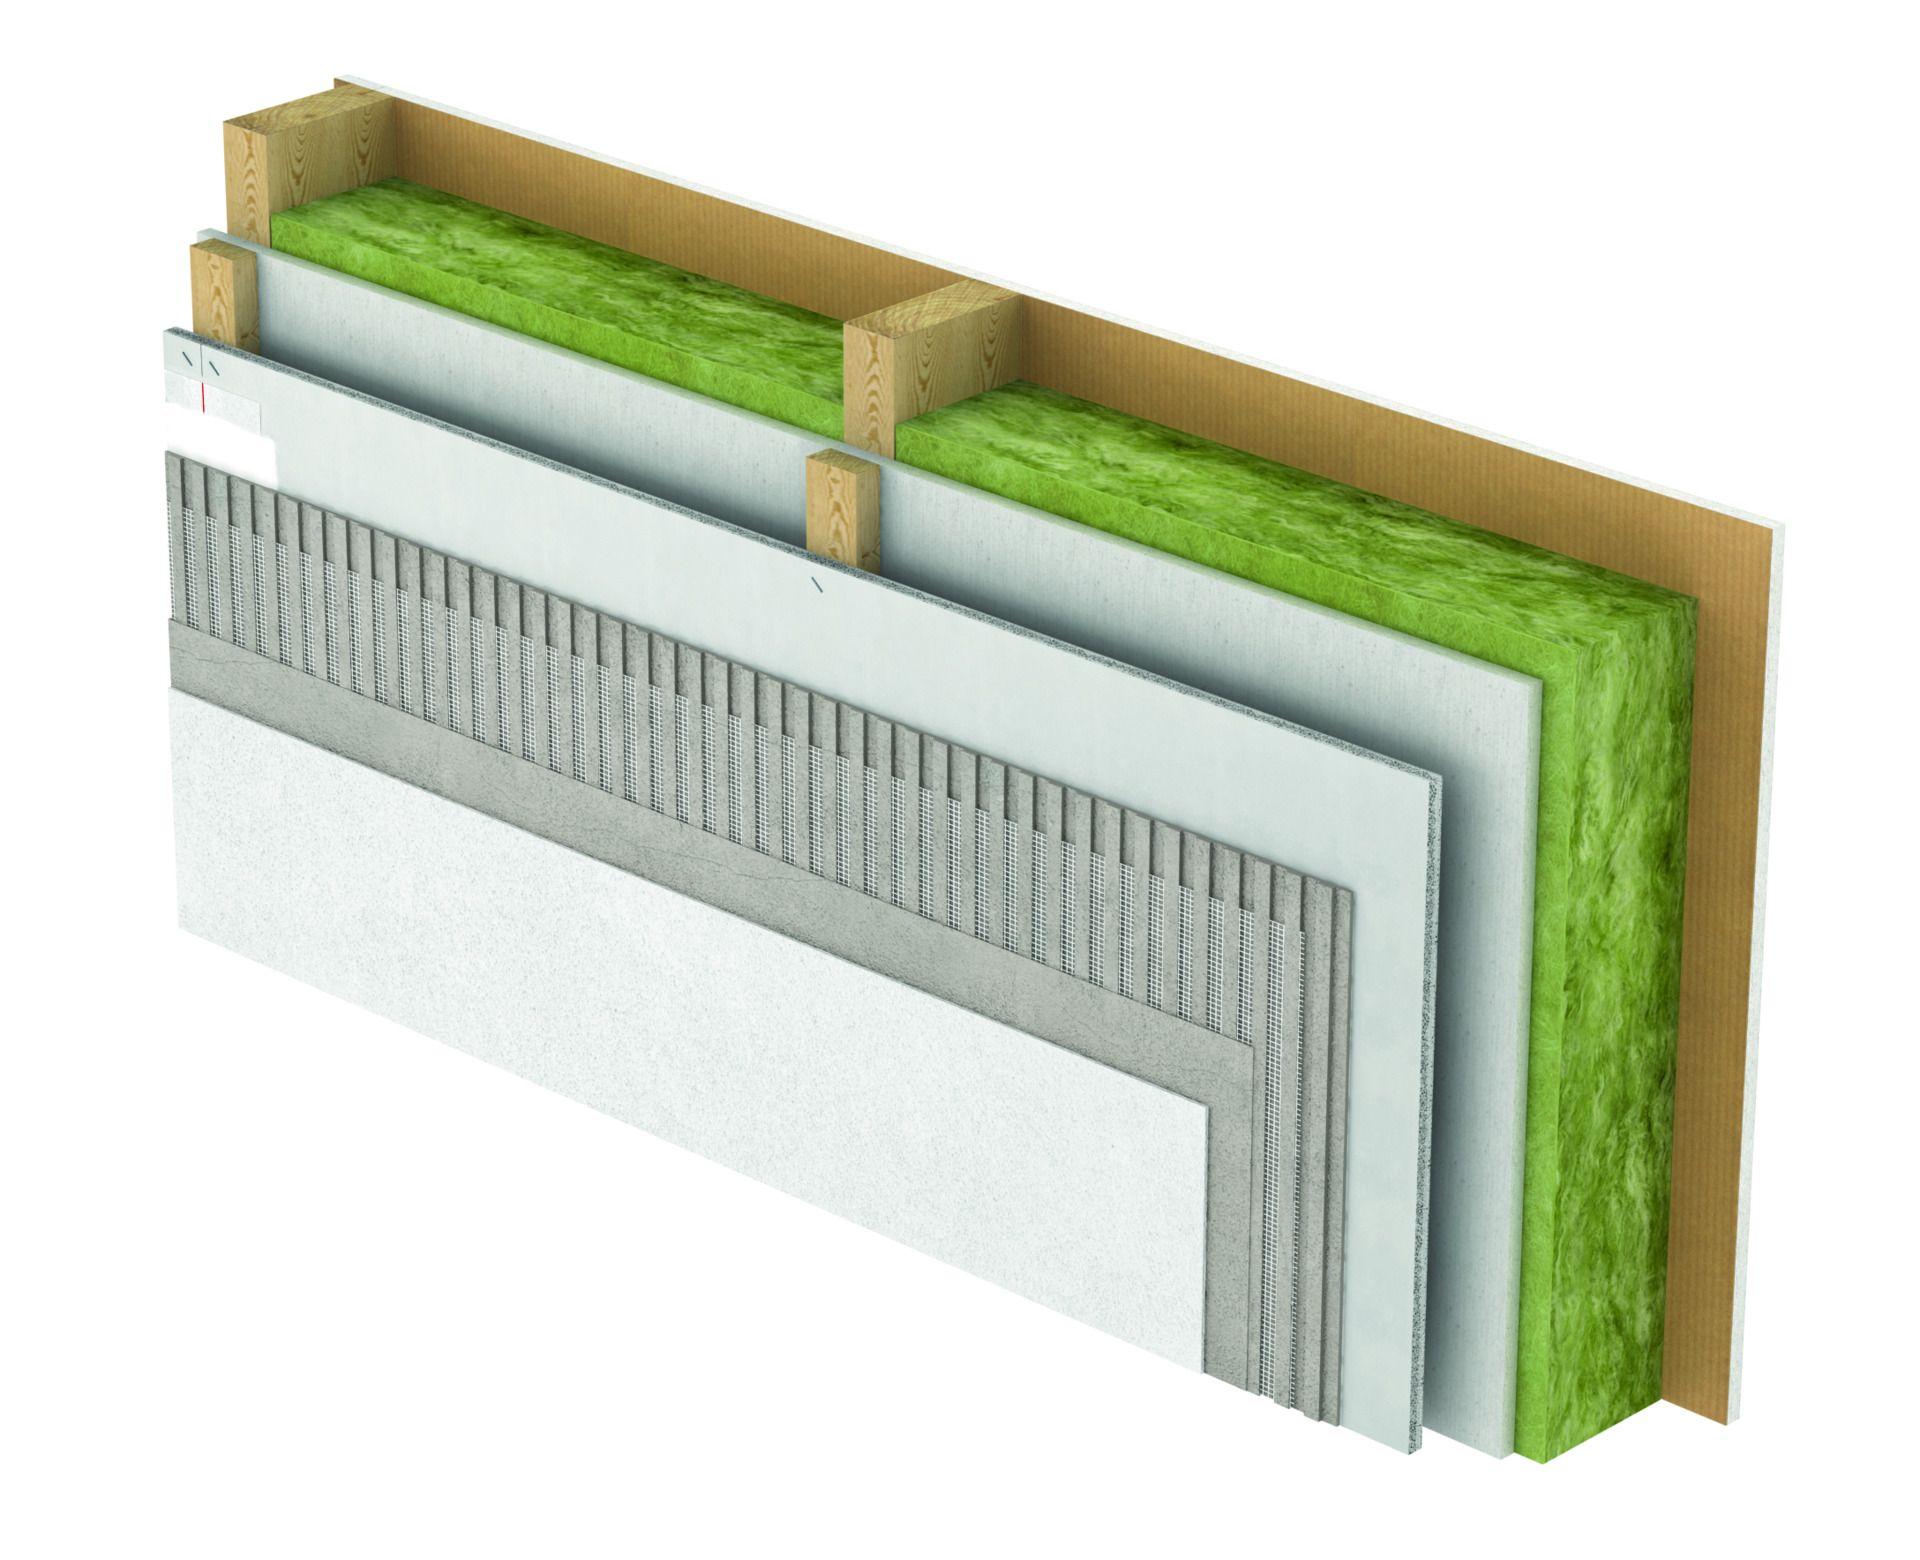 fermacell platten verlegen amazing beautiful fermacell mm. Black Bedroom Furniture Sets. Home Design Ideas